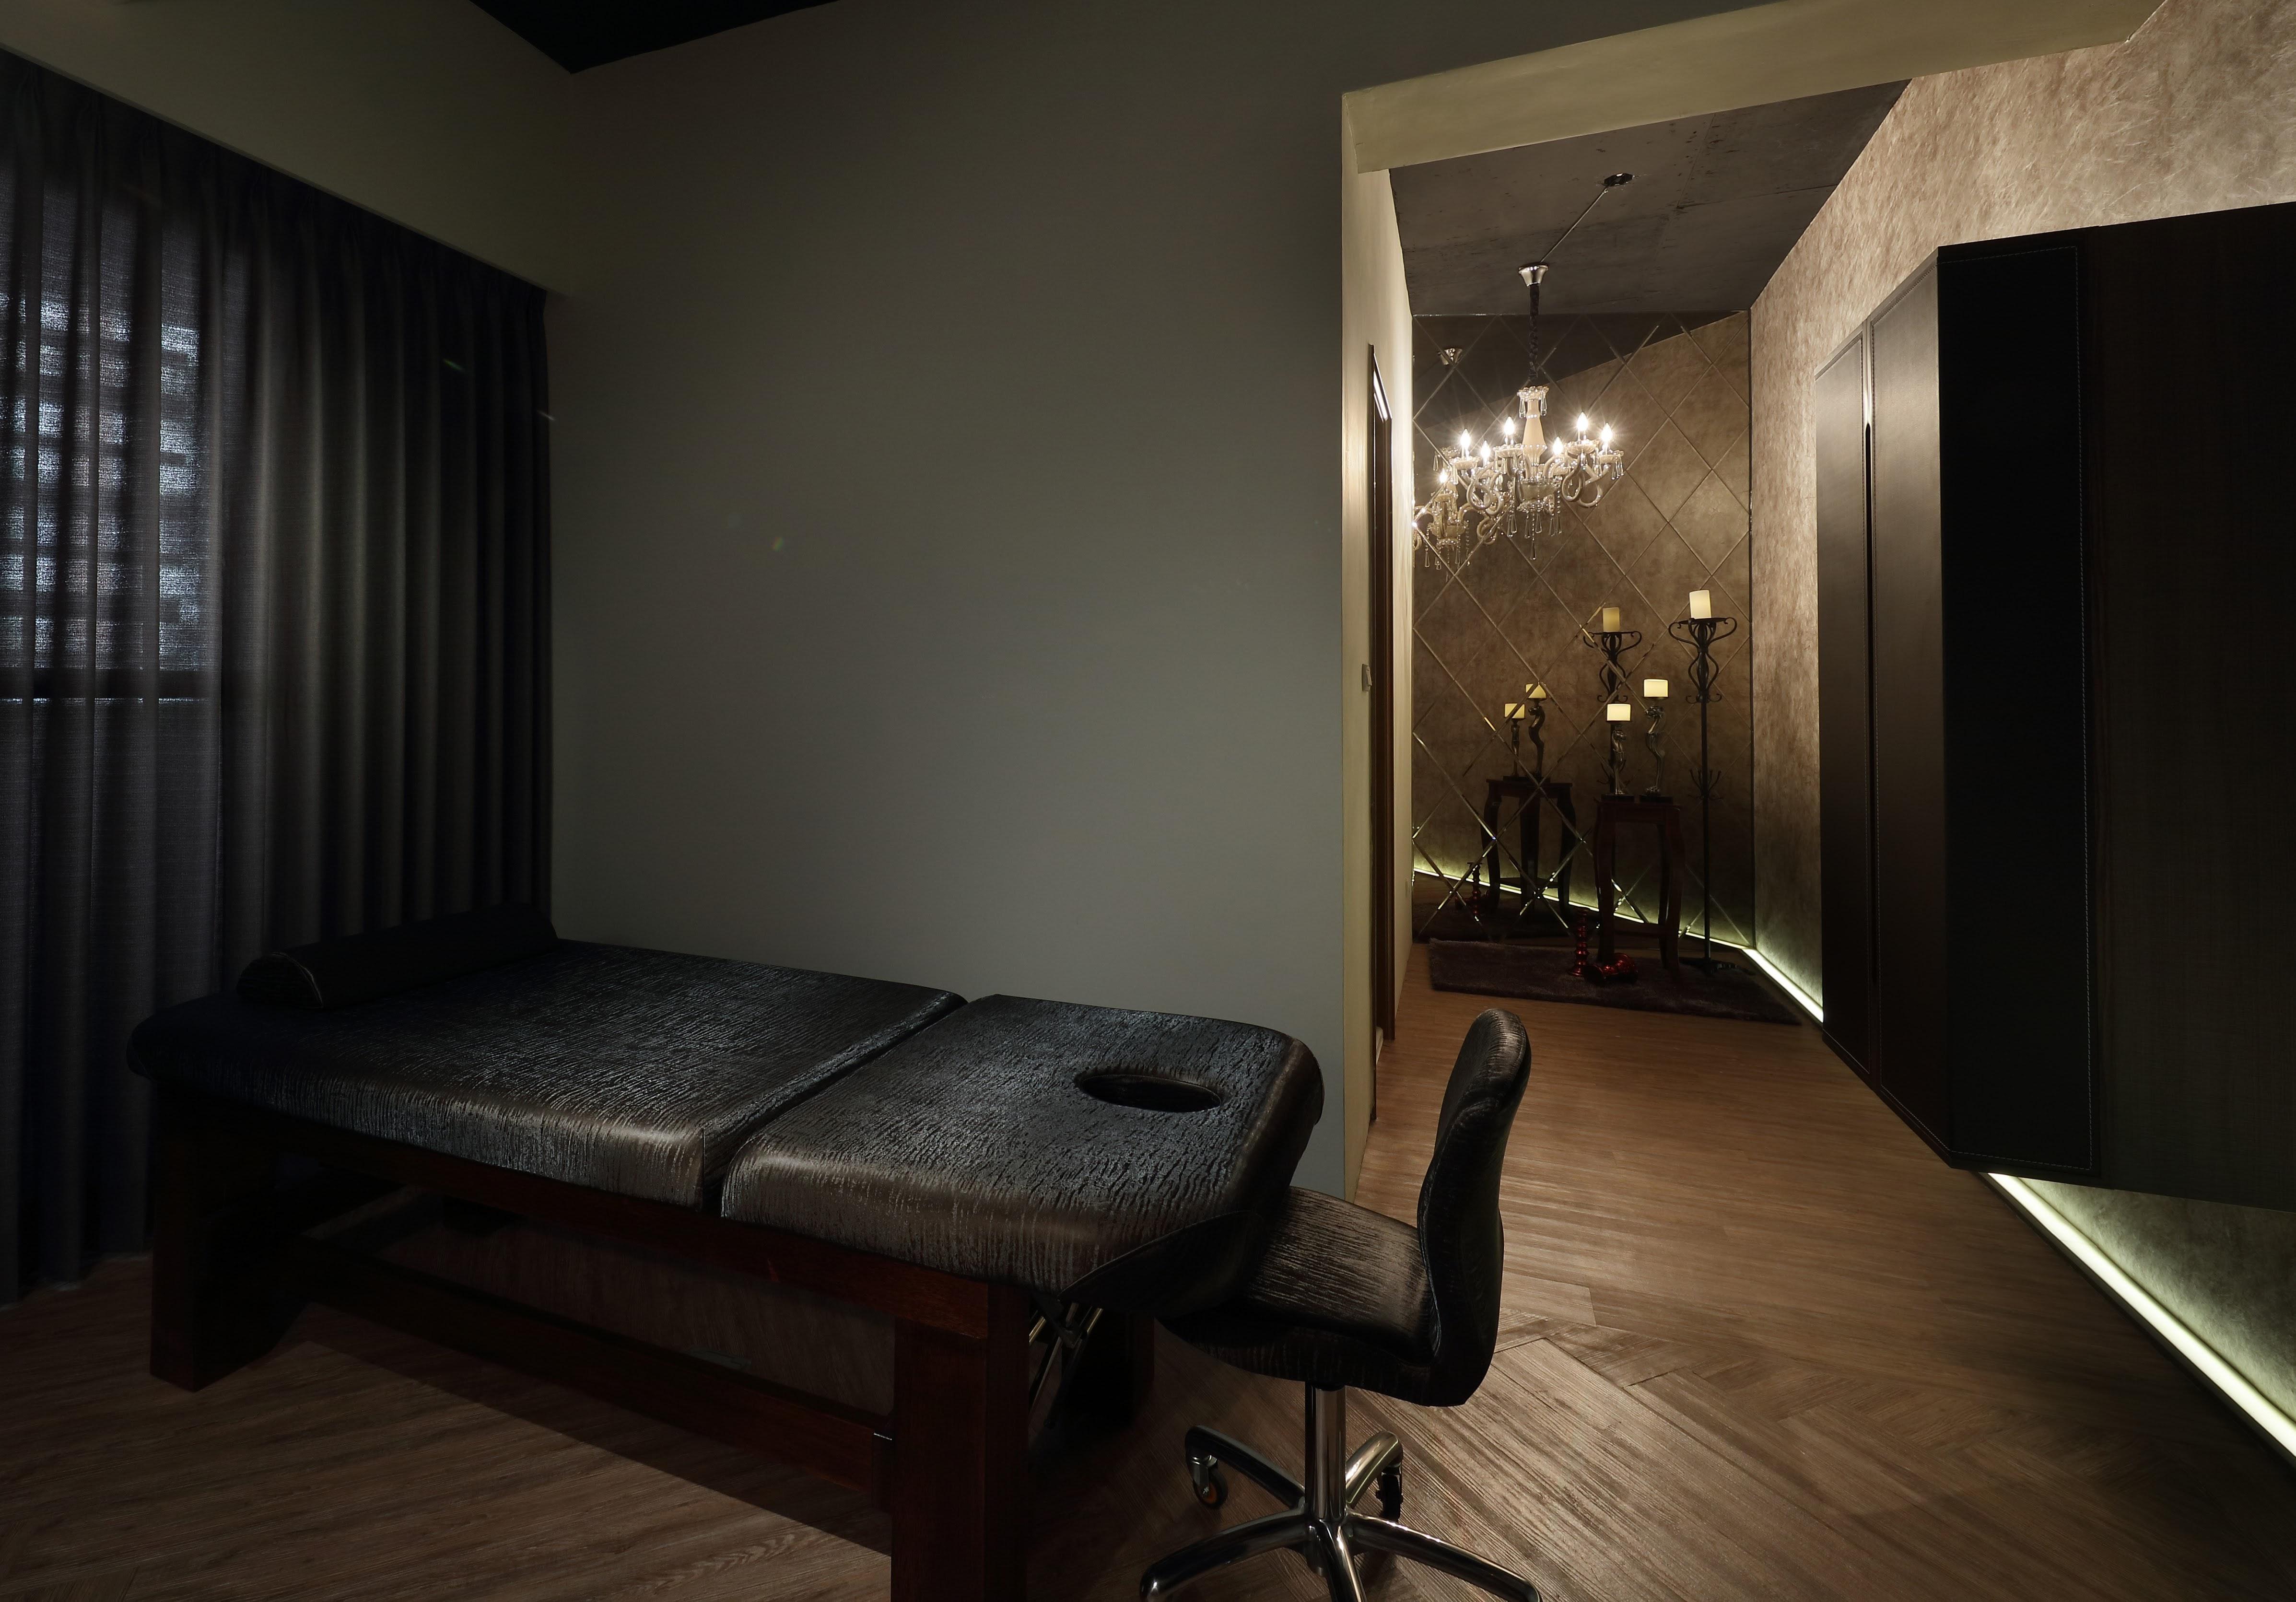 An Asian Massage Will Make A Wonderful Birthday present